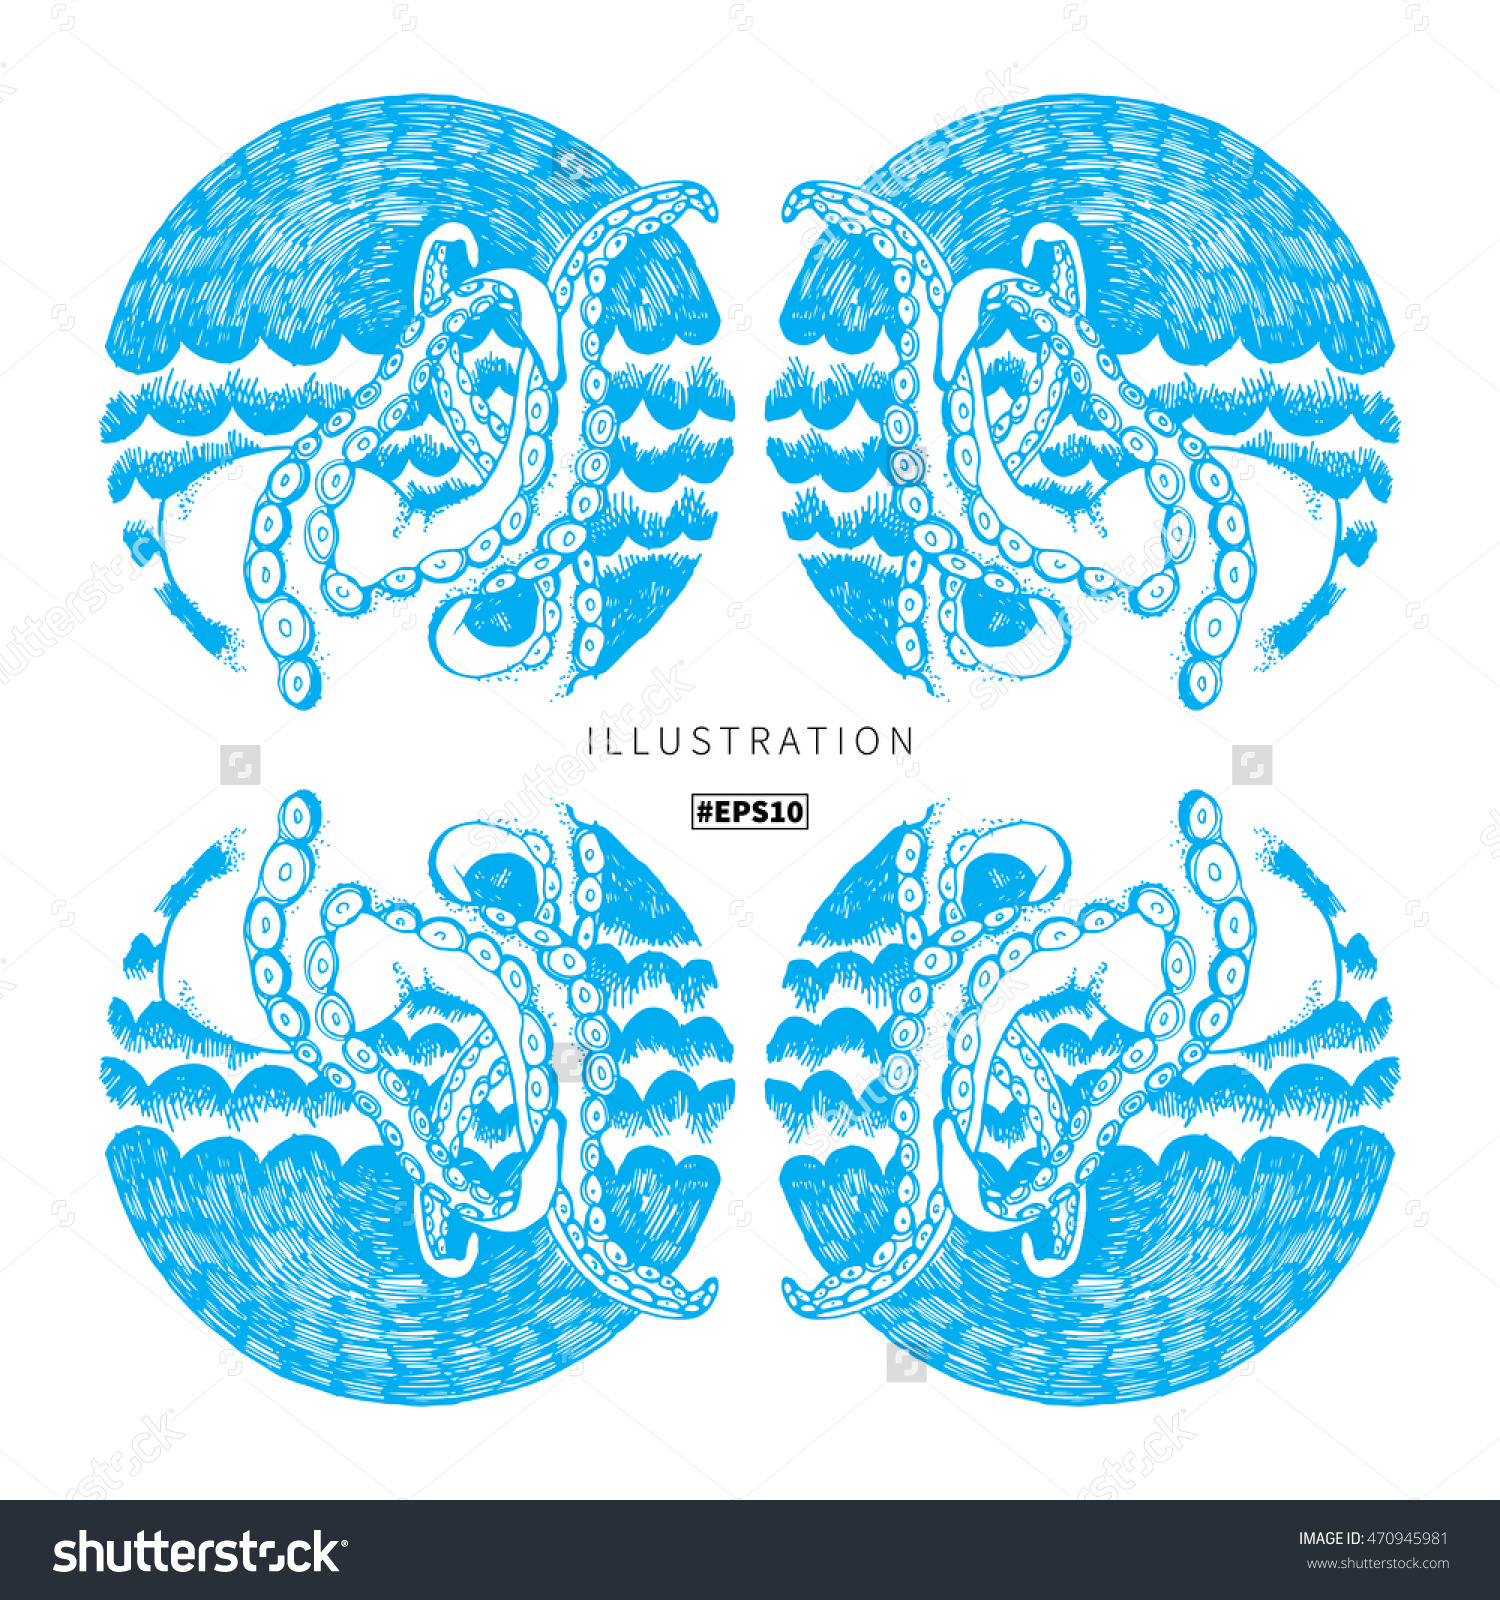 Octopus, Sea, Night Sky, Waves, Underwater World Inky Circle Icon.